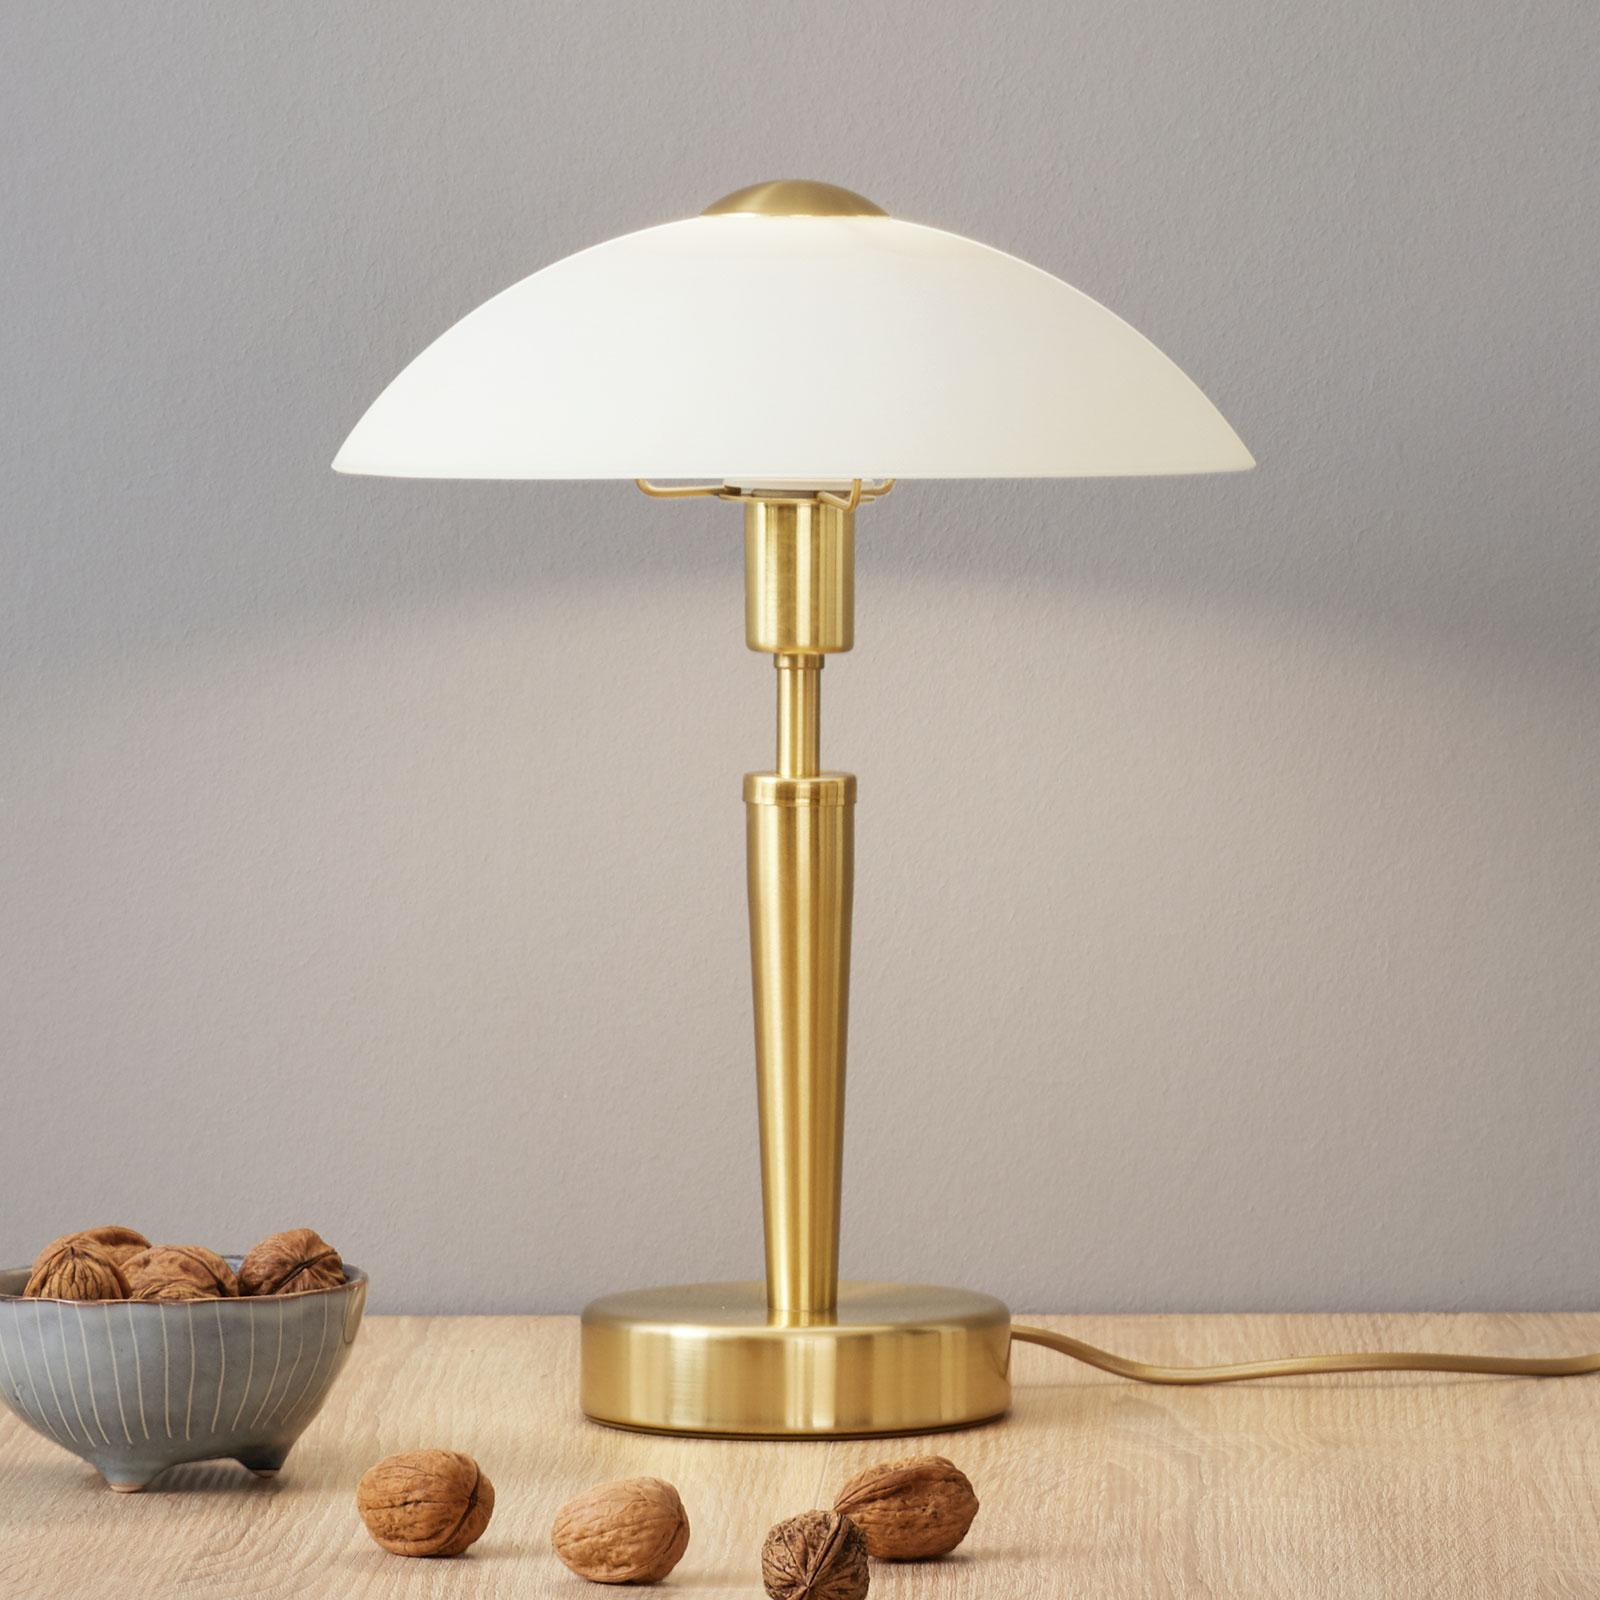 Elegant bordslampa Salut, mässing, vit